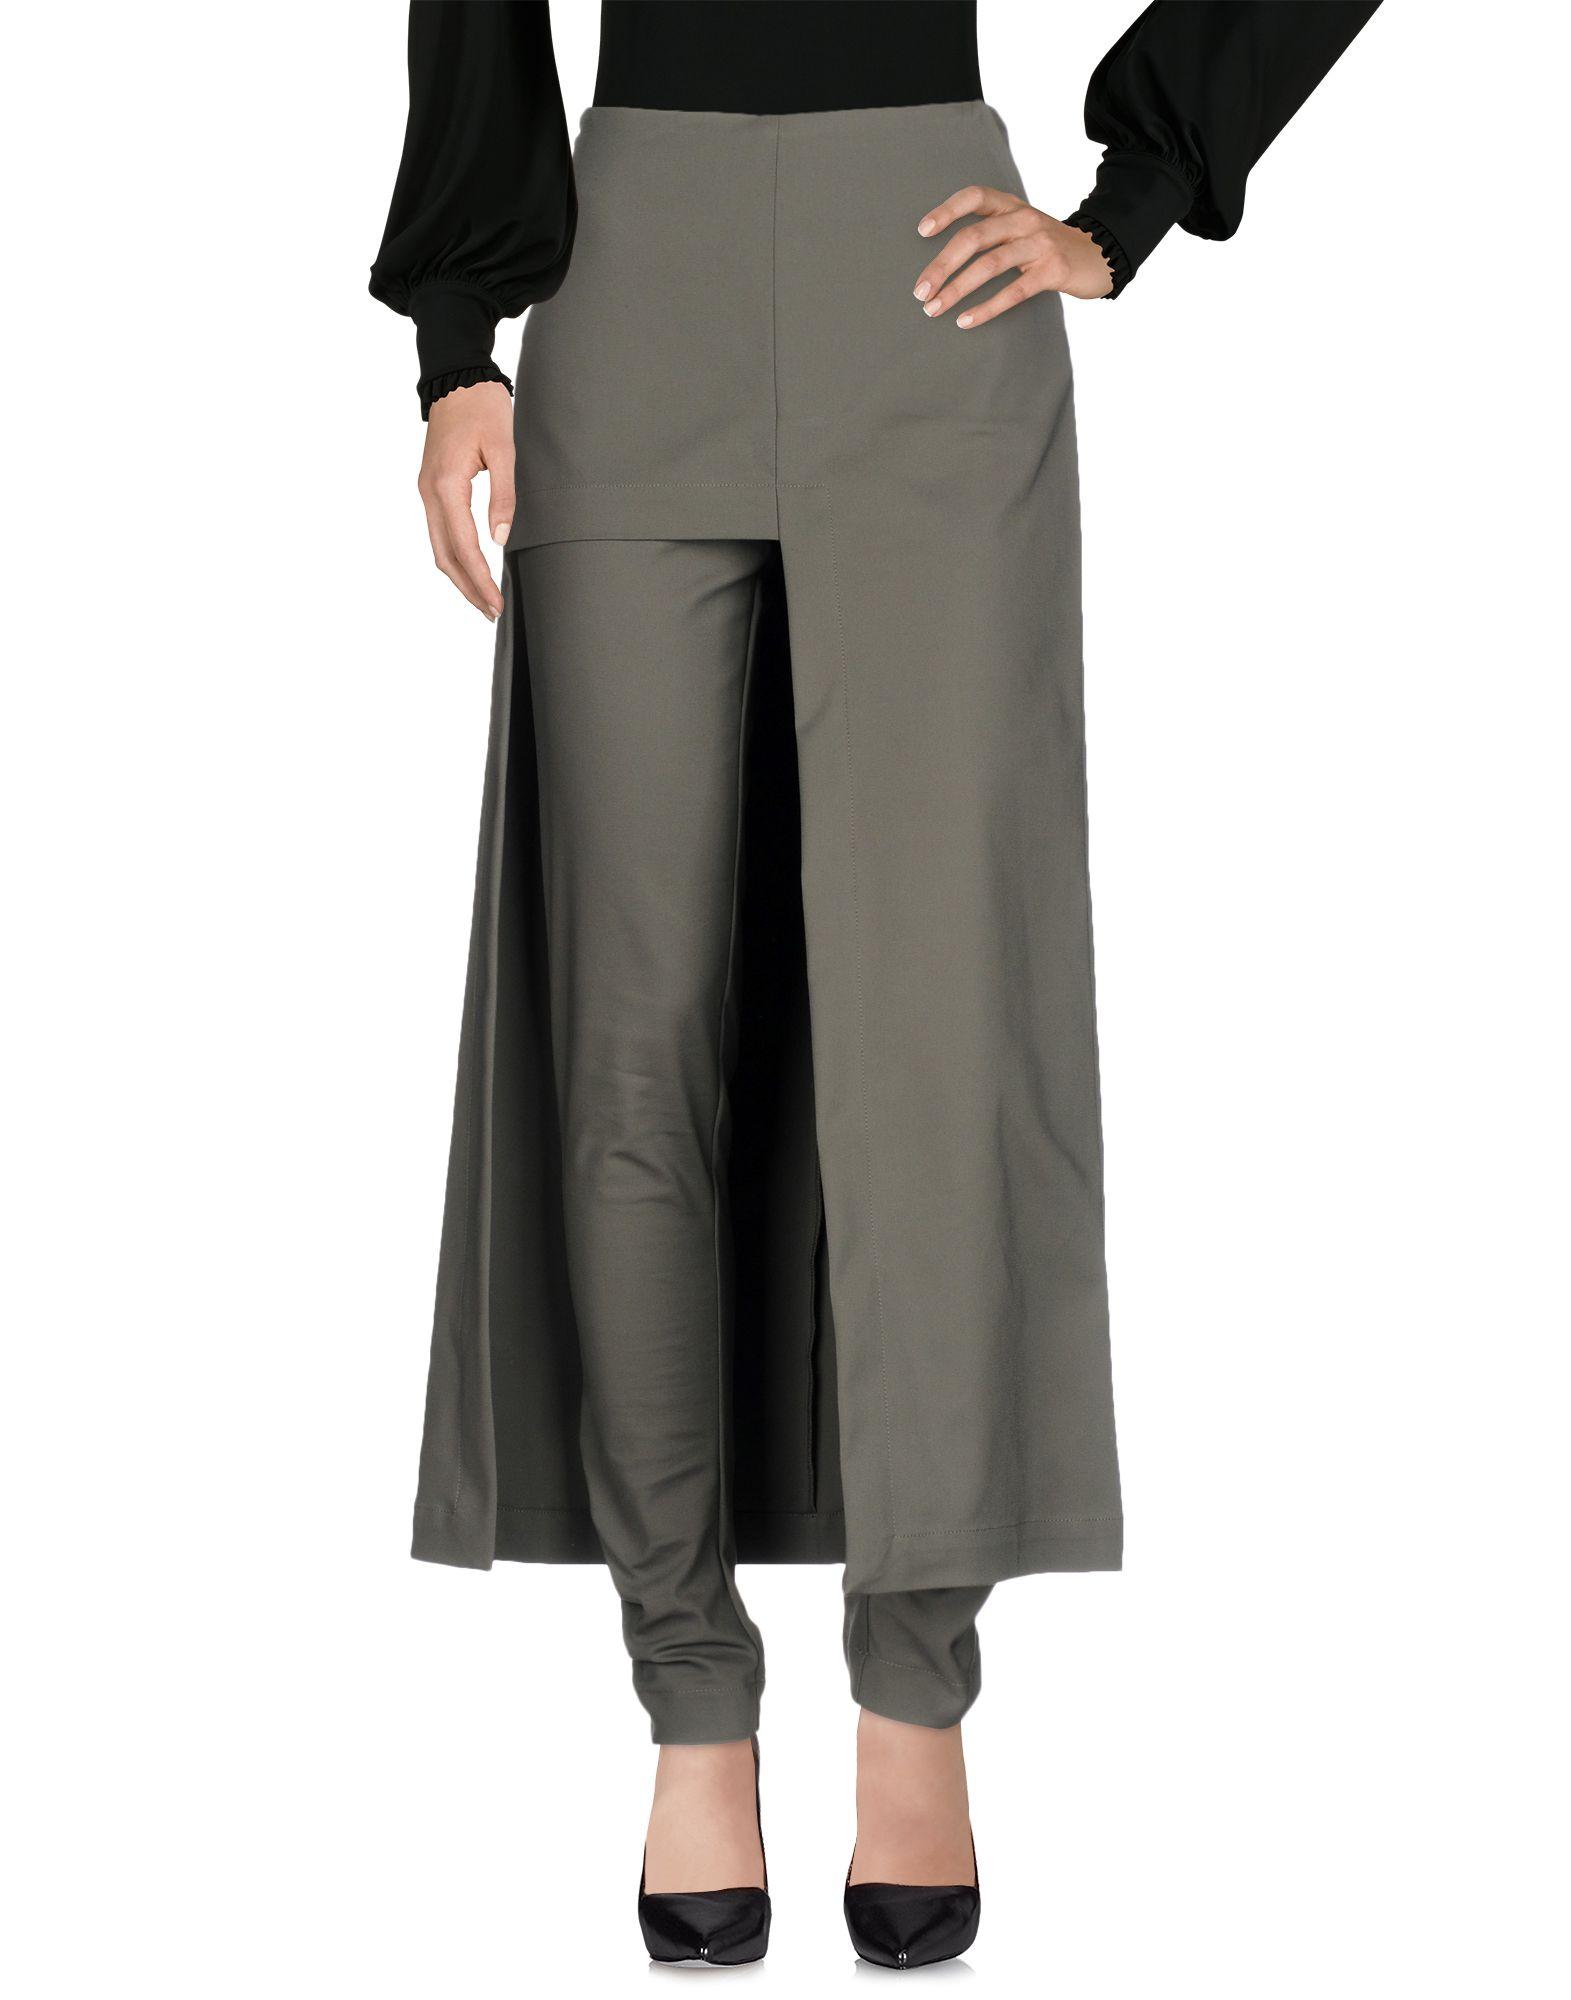 Pantalone Oblique Creations Donna - Acquista online su gQPx2TM